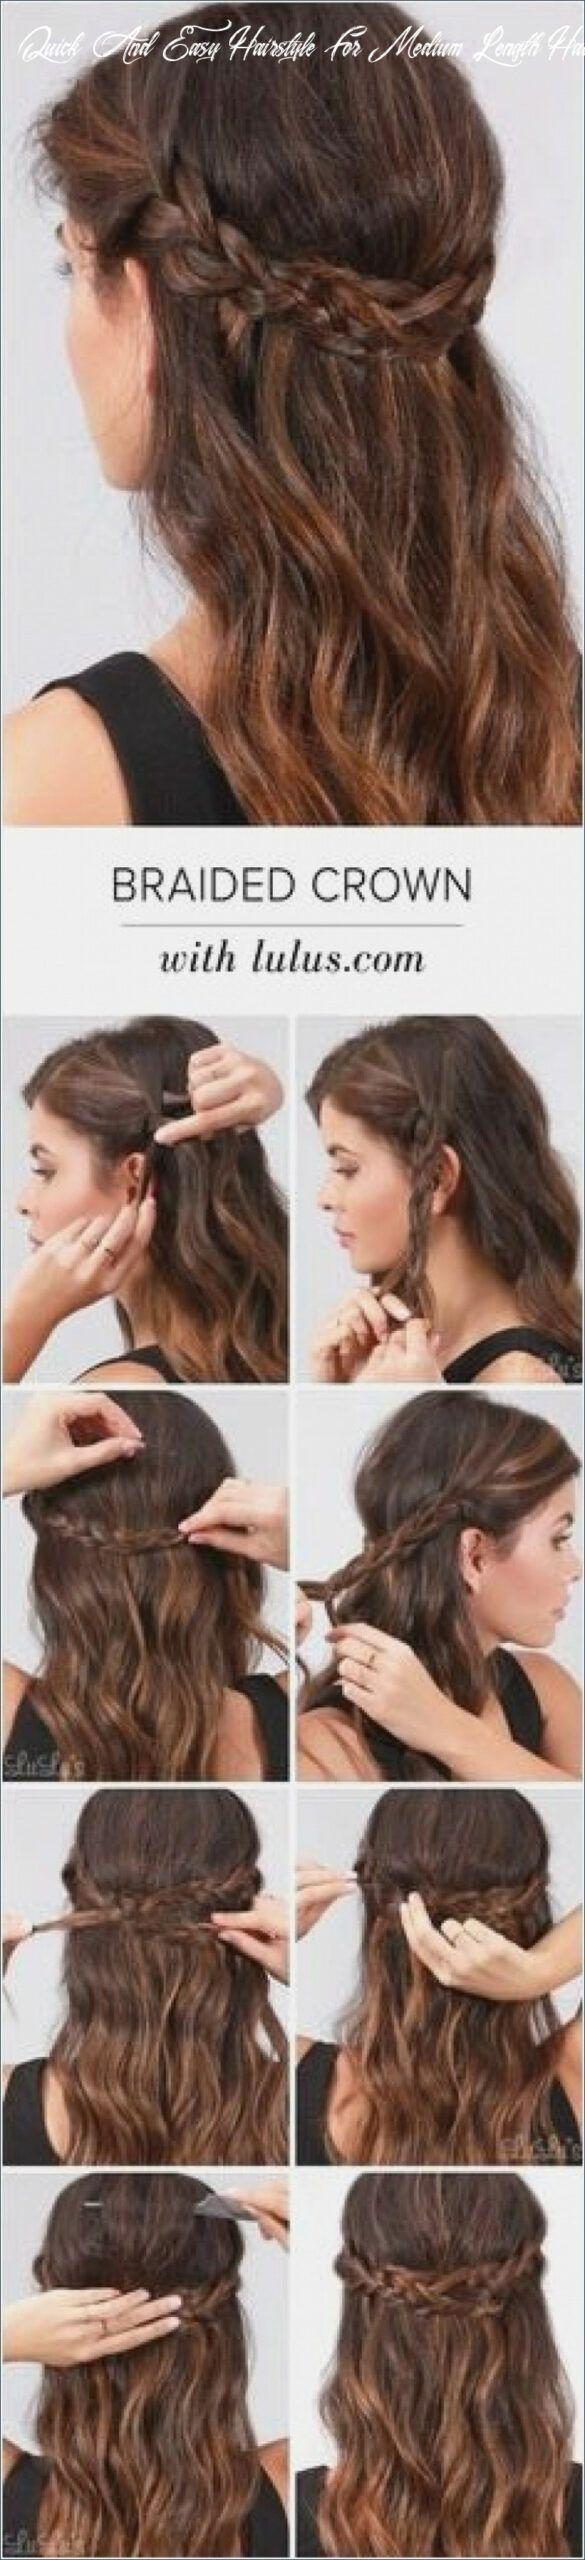 12 Quick And Easy Hairstyle For Medium Length Hair Di 2020 Gaya Rambut Rambut Keriting Keriting